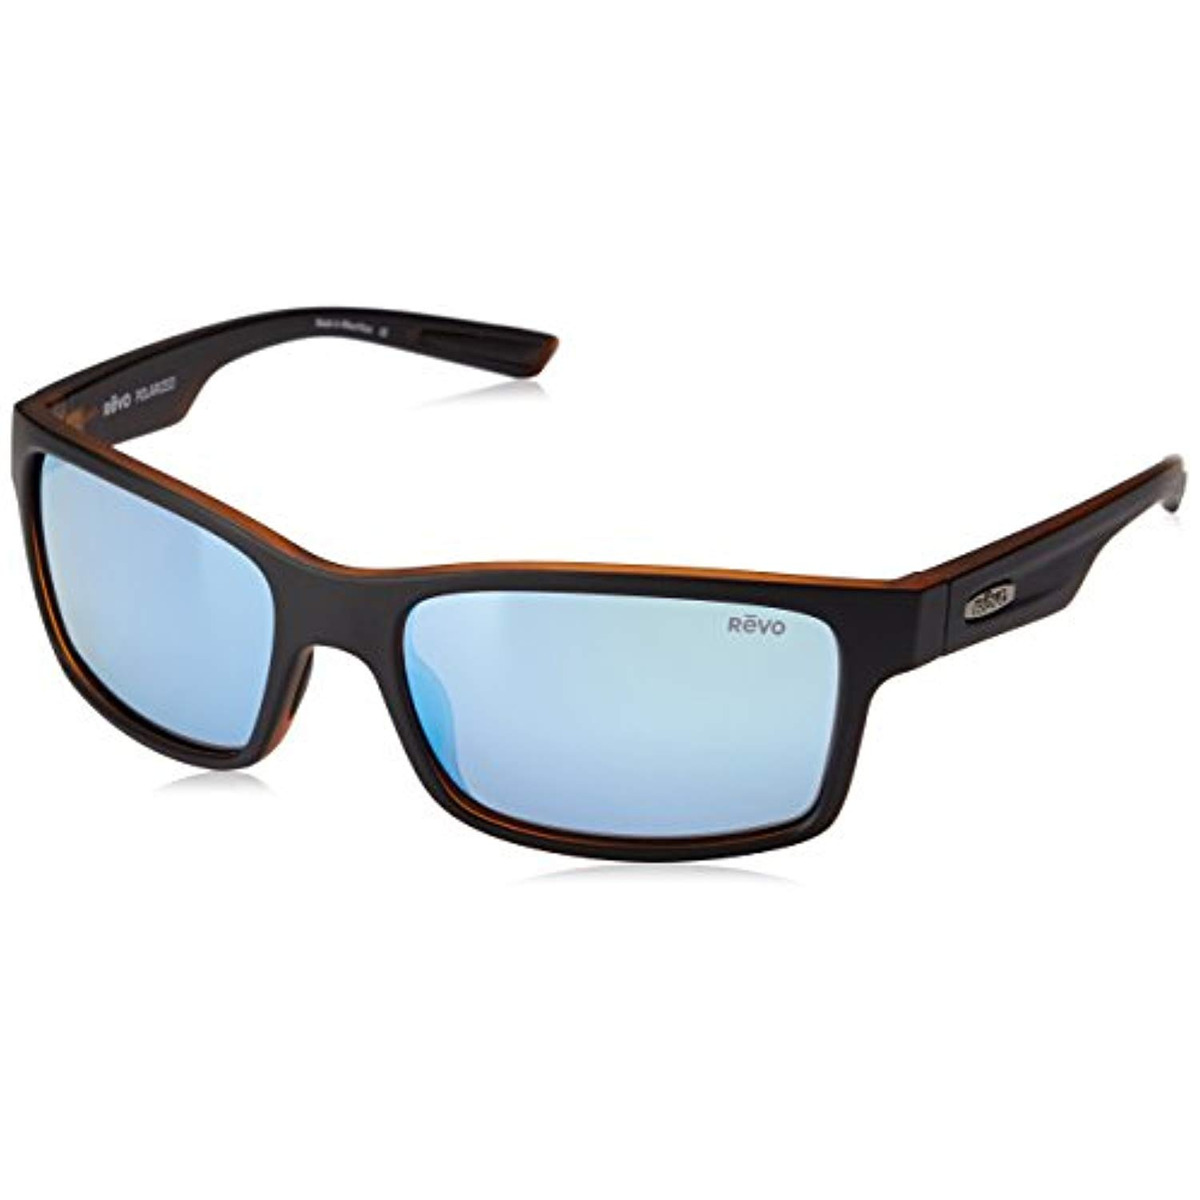 78f1d94276 revo crawler re 1027 01 o gafas de sol rectangulares. Cargando zoom.